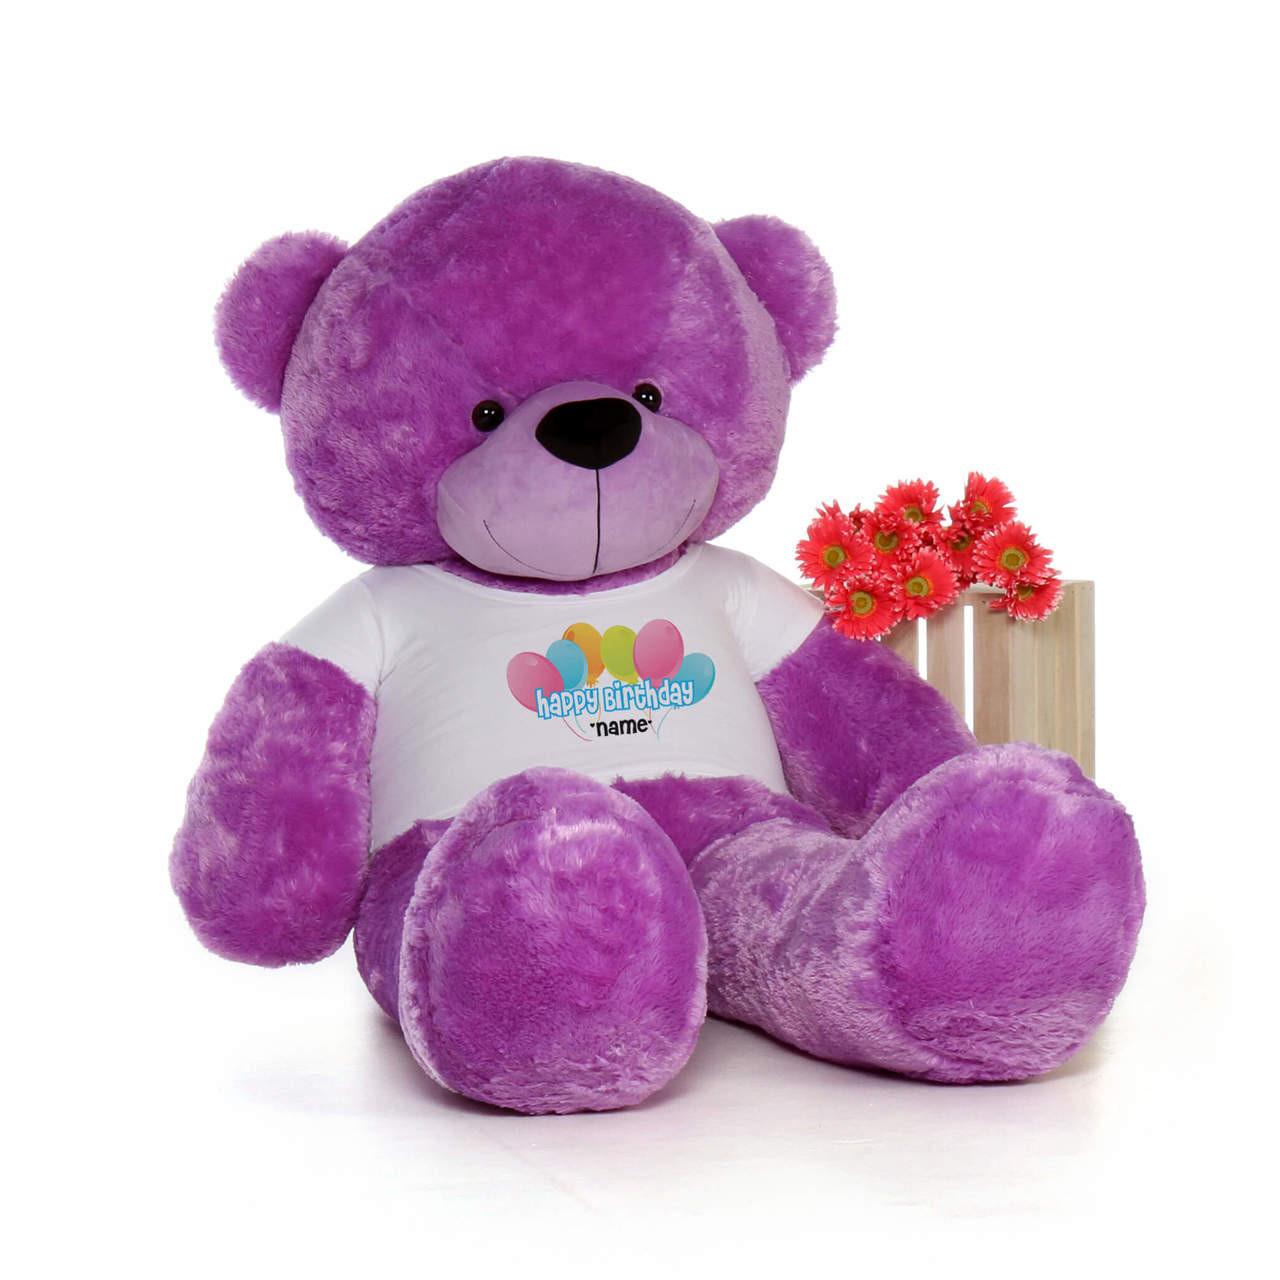 72in Purple DeeDee Cuddles Happy Birthday Personalized Teddy Bear